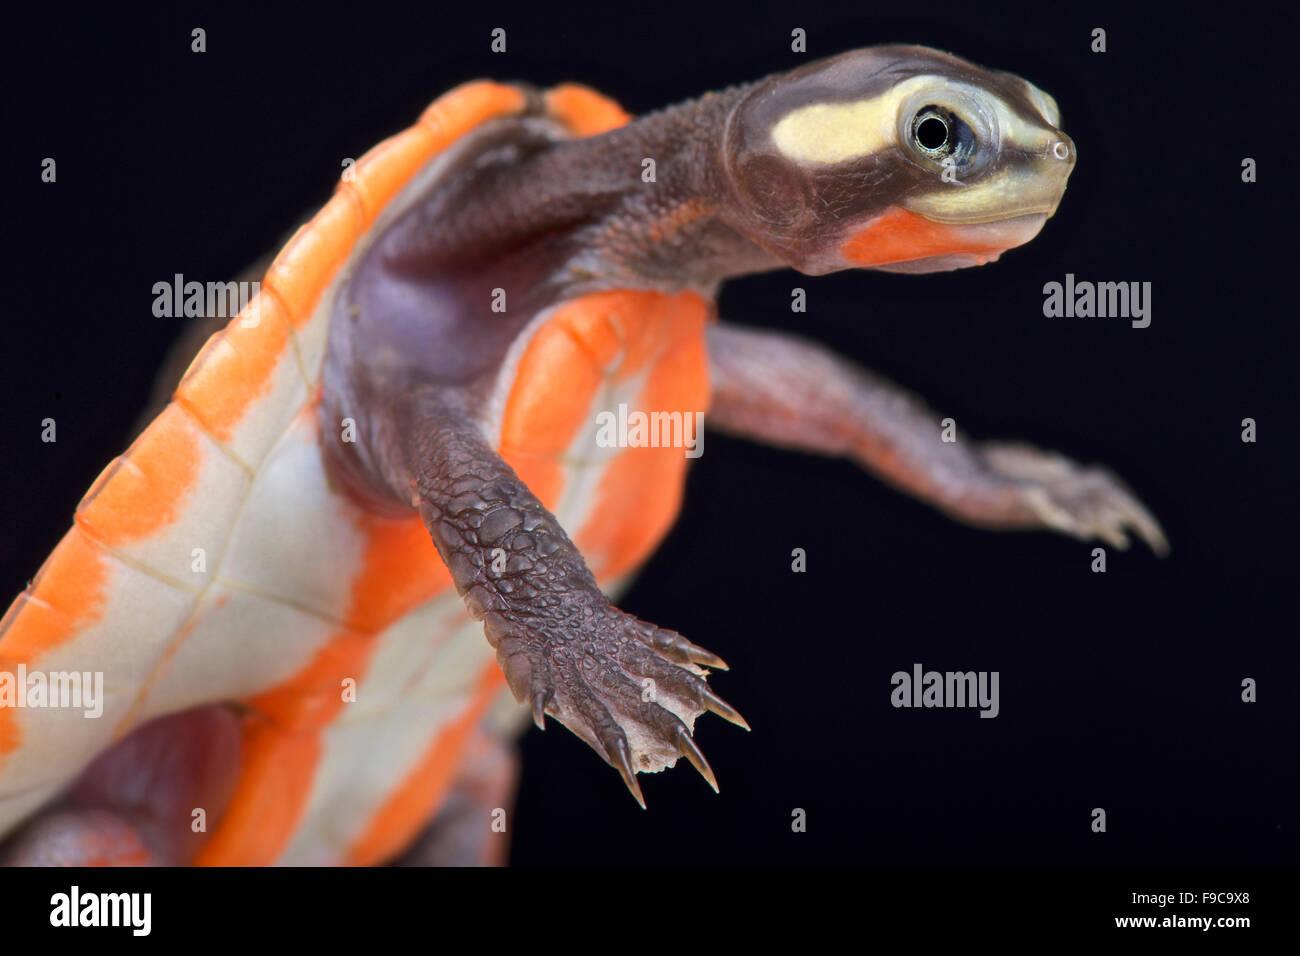 Red-bellied Shortneck Turtle (Emydura subglobosa) - Stock Image